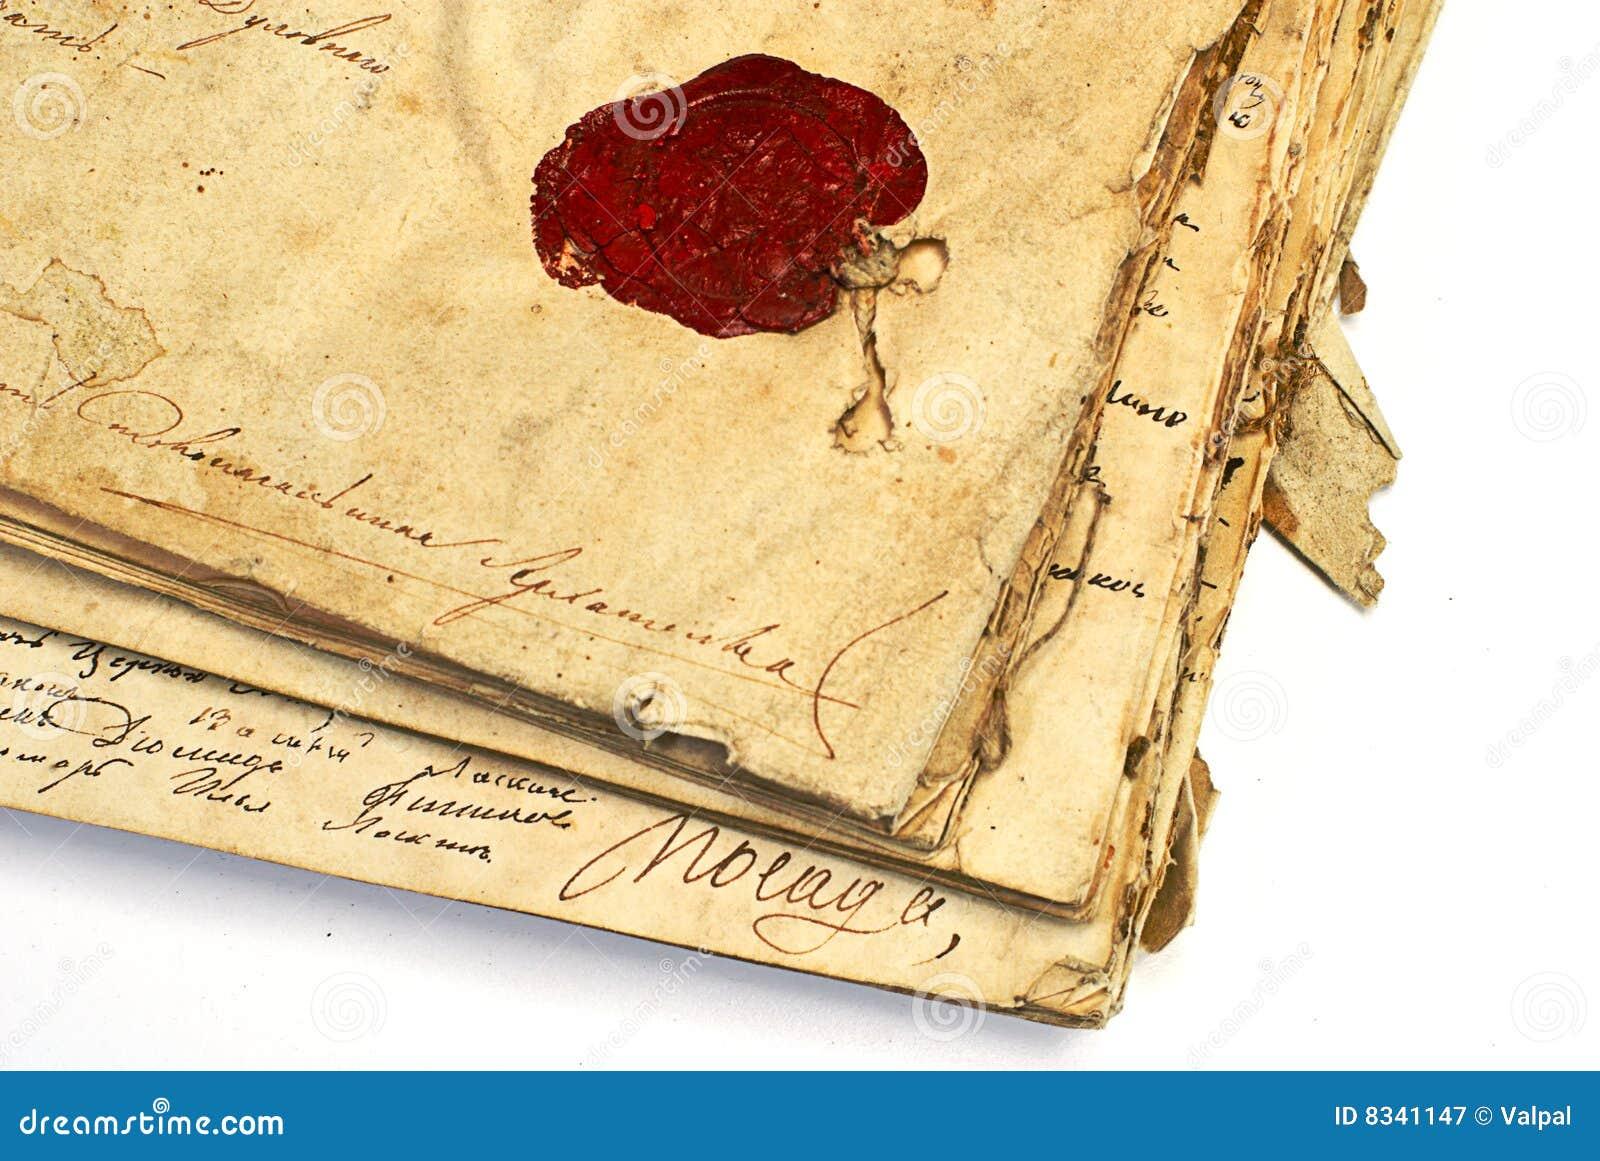 Manuscript met waszegel